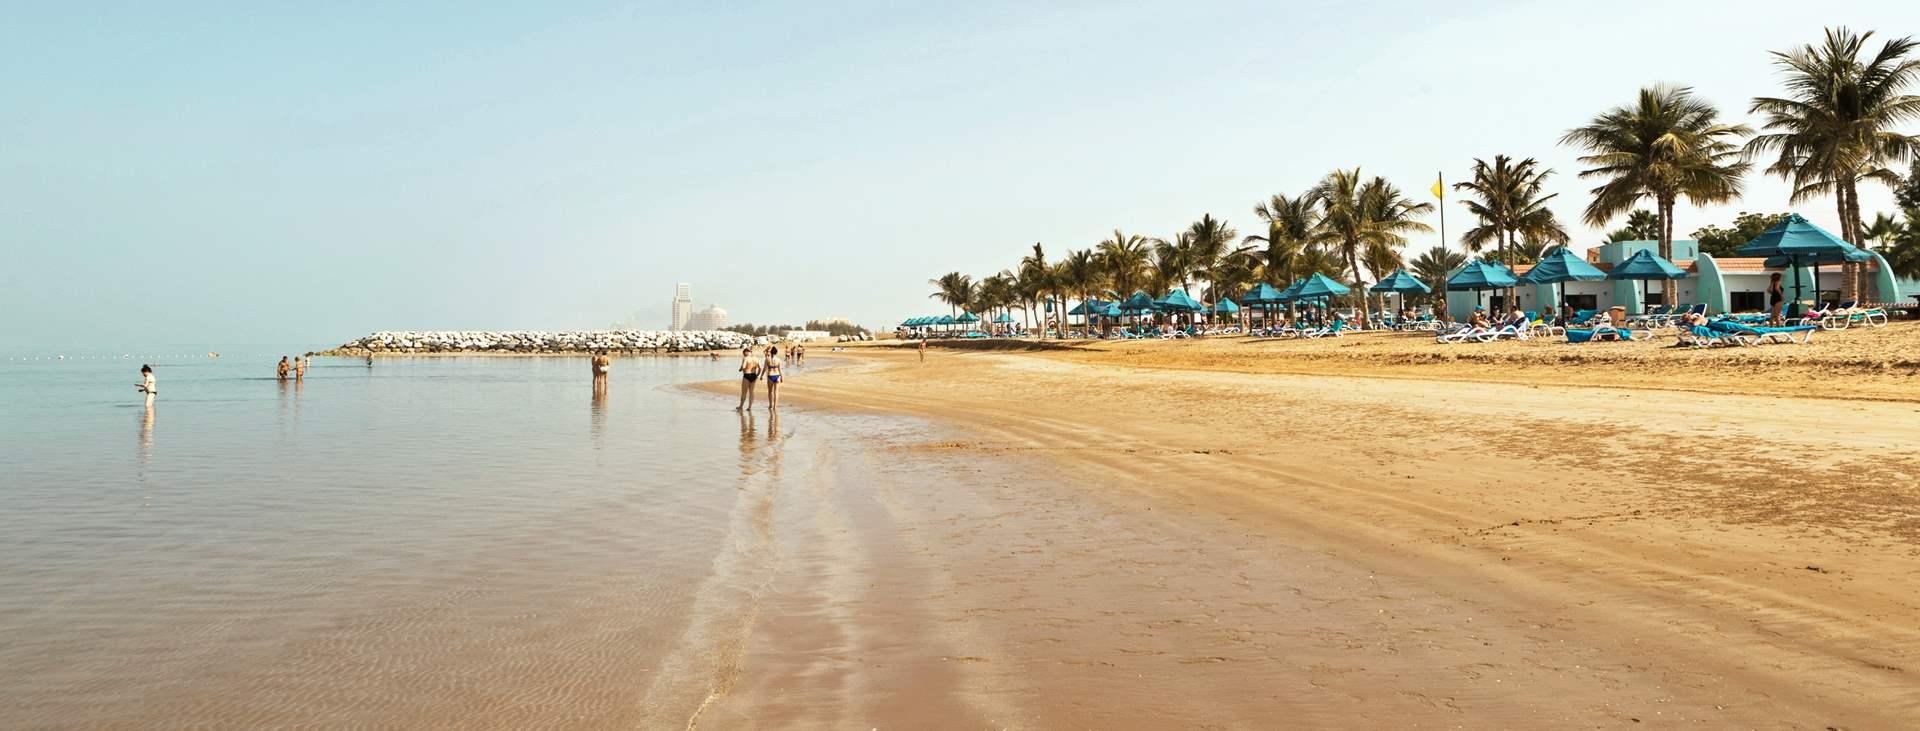 Stranden ved Smartline Ras Al Khaimah Beach Resort